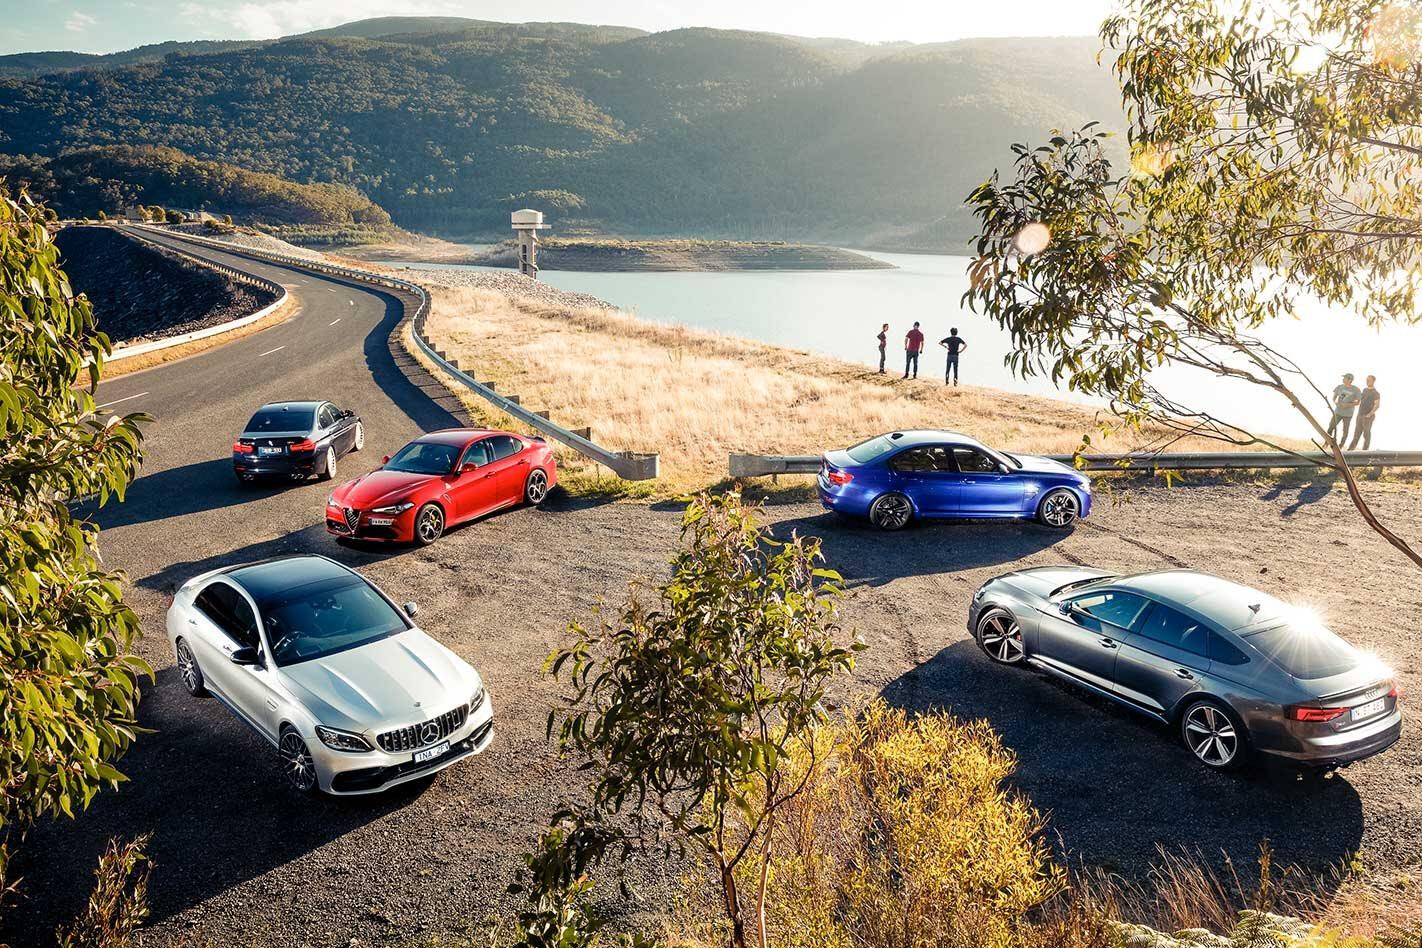 2019 Mercedes-AMG C63 S vs Audi RS5 Sportback vs BMW M3 Pure vs Alfa Romeo Giulia Q vs Alpina B3 S comparison review